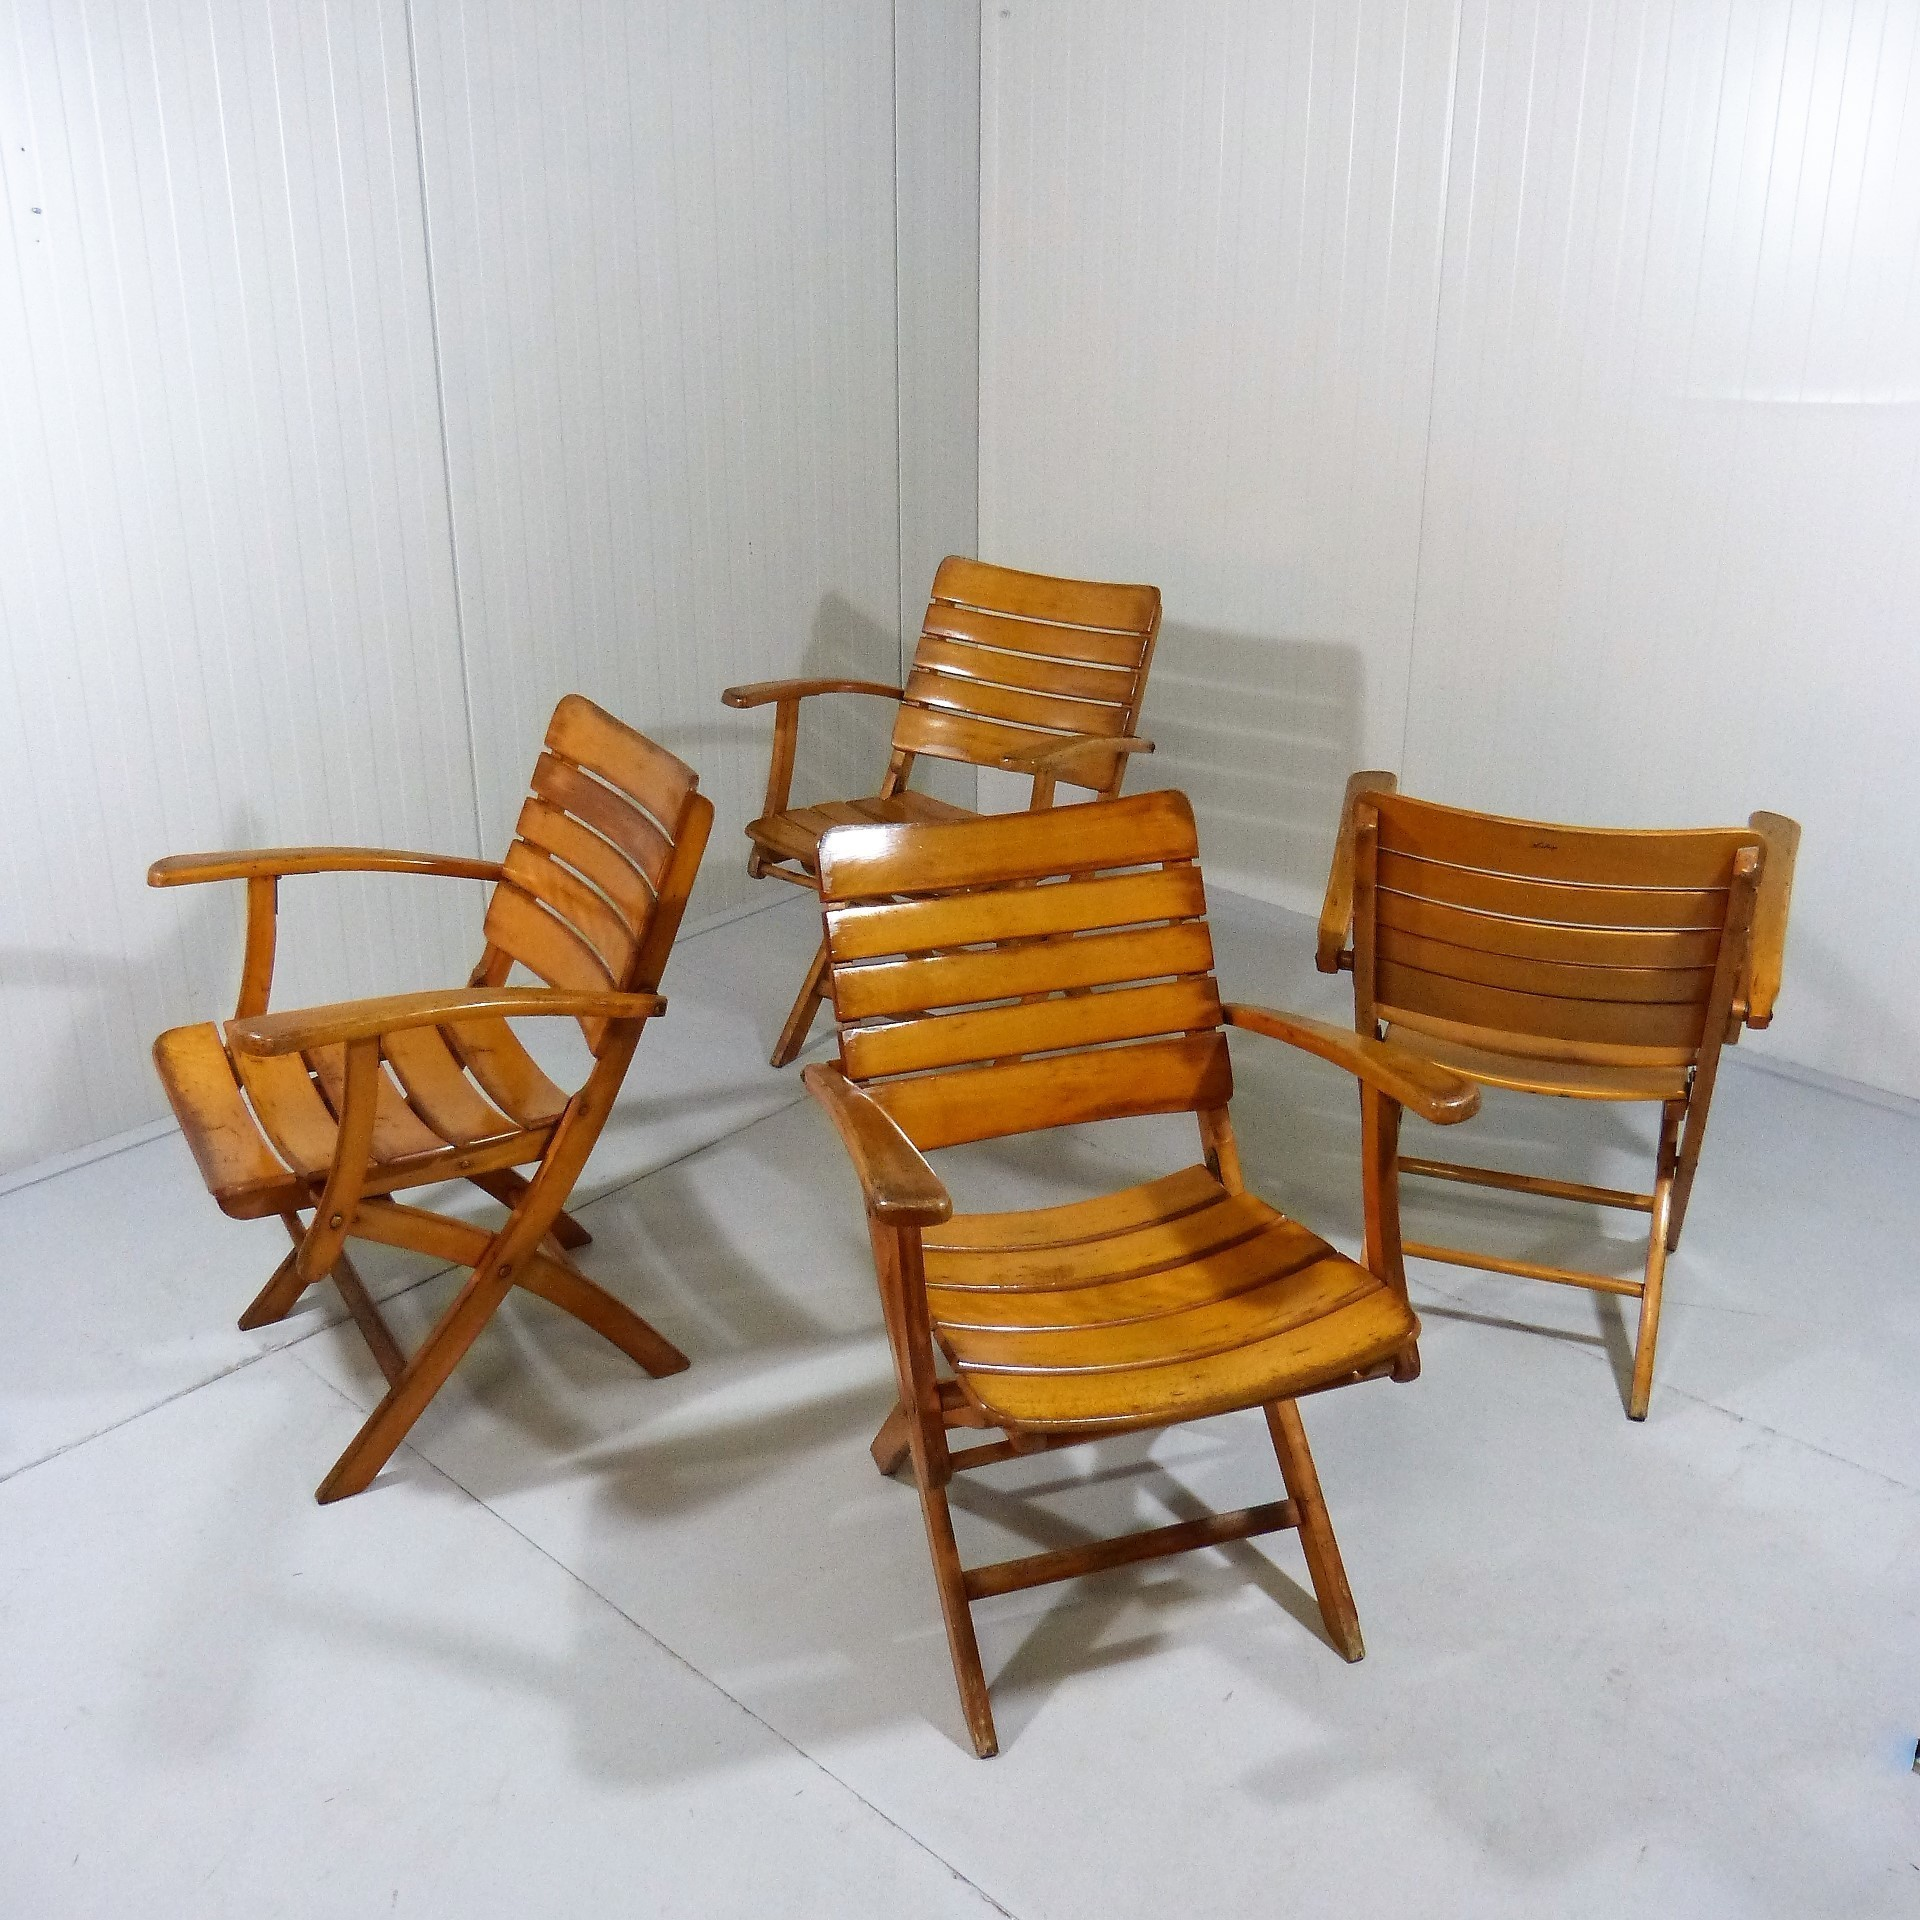 Set Of 4 Wooden Folding Garden Chairs By Herlag 1960 S Herlag Vinterior